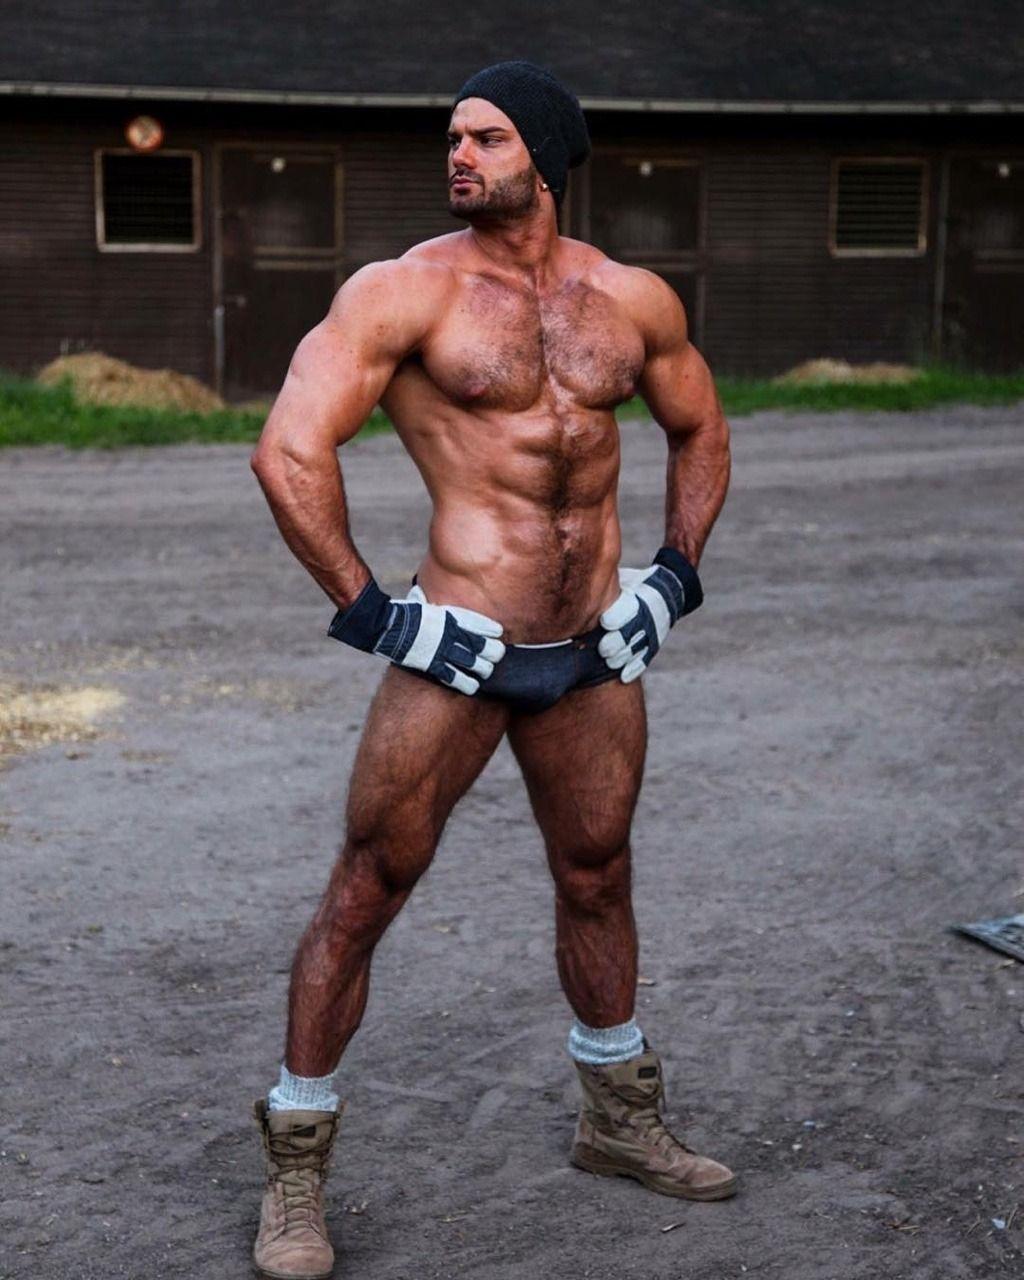 Lebannese guy nude photo